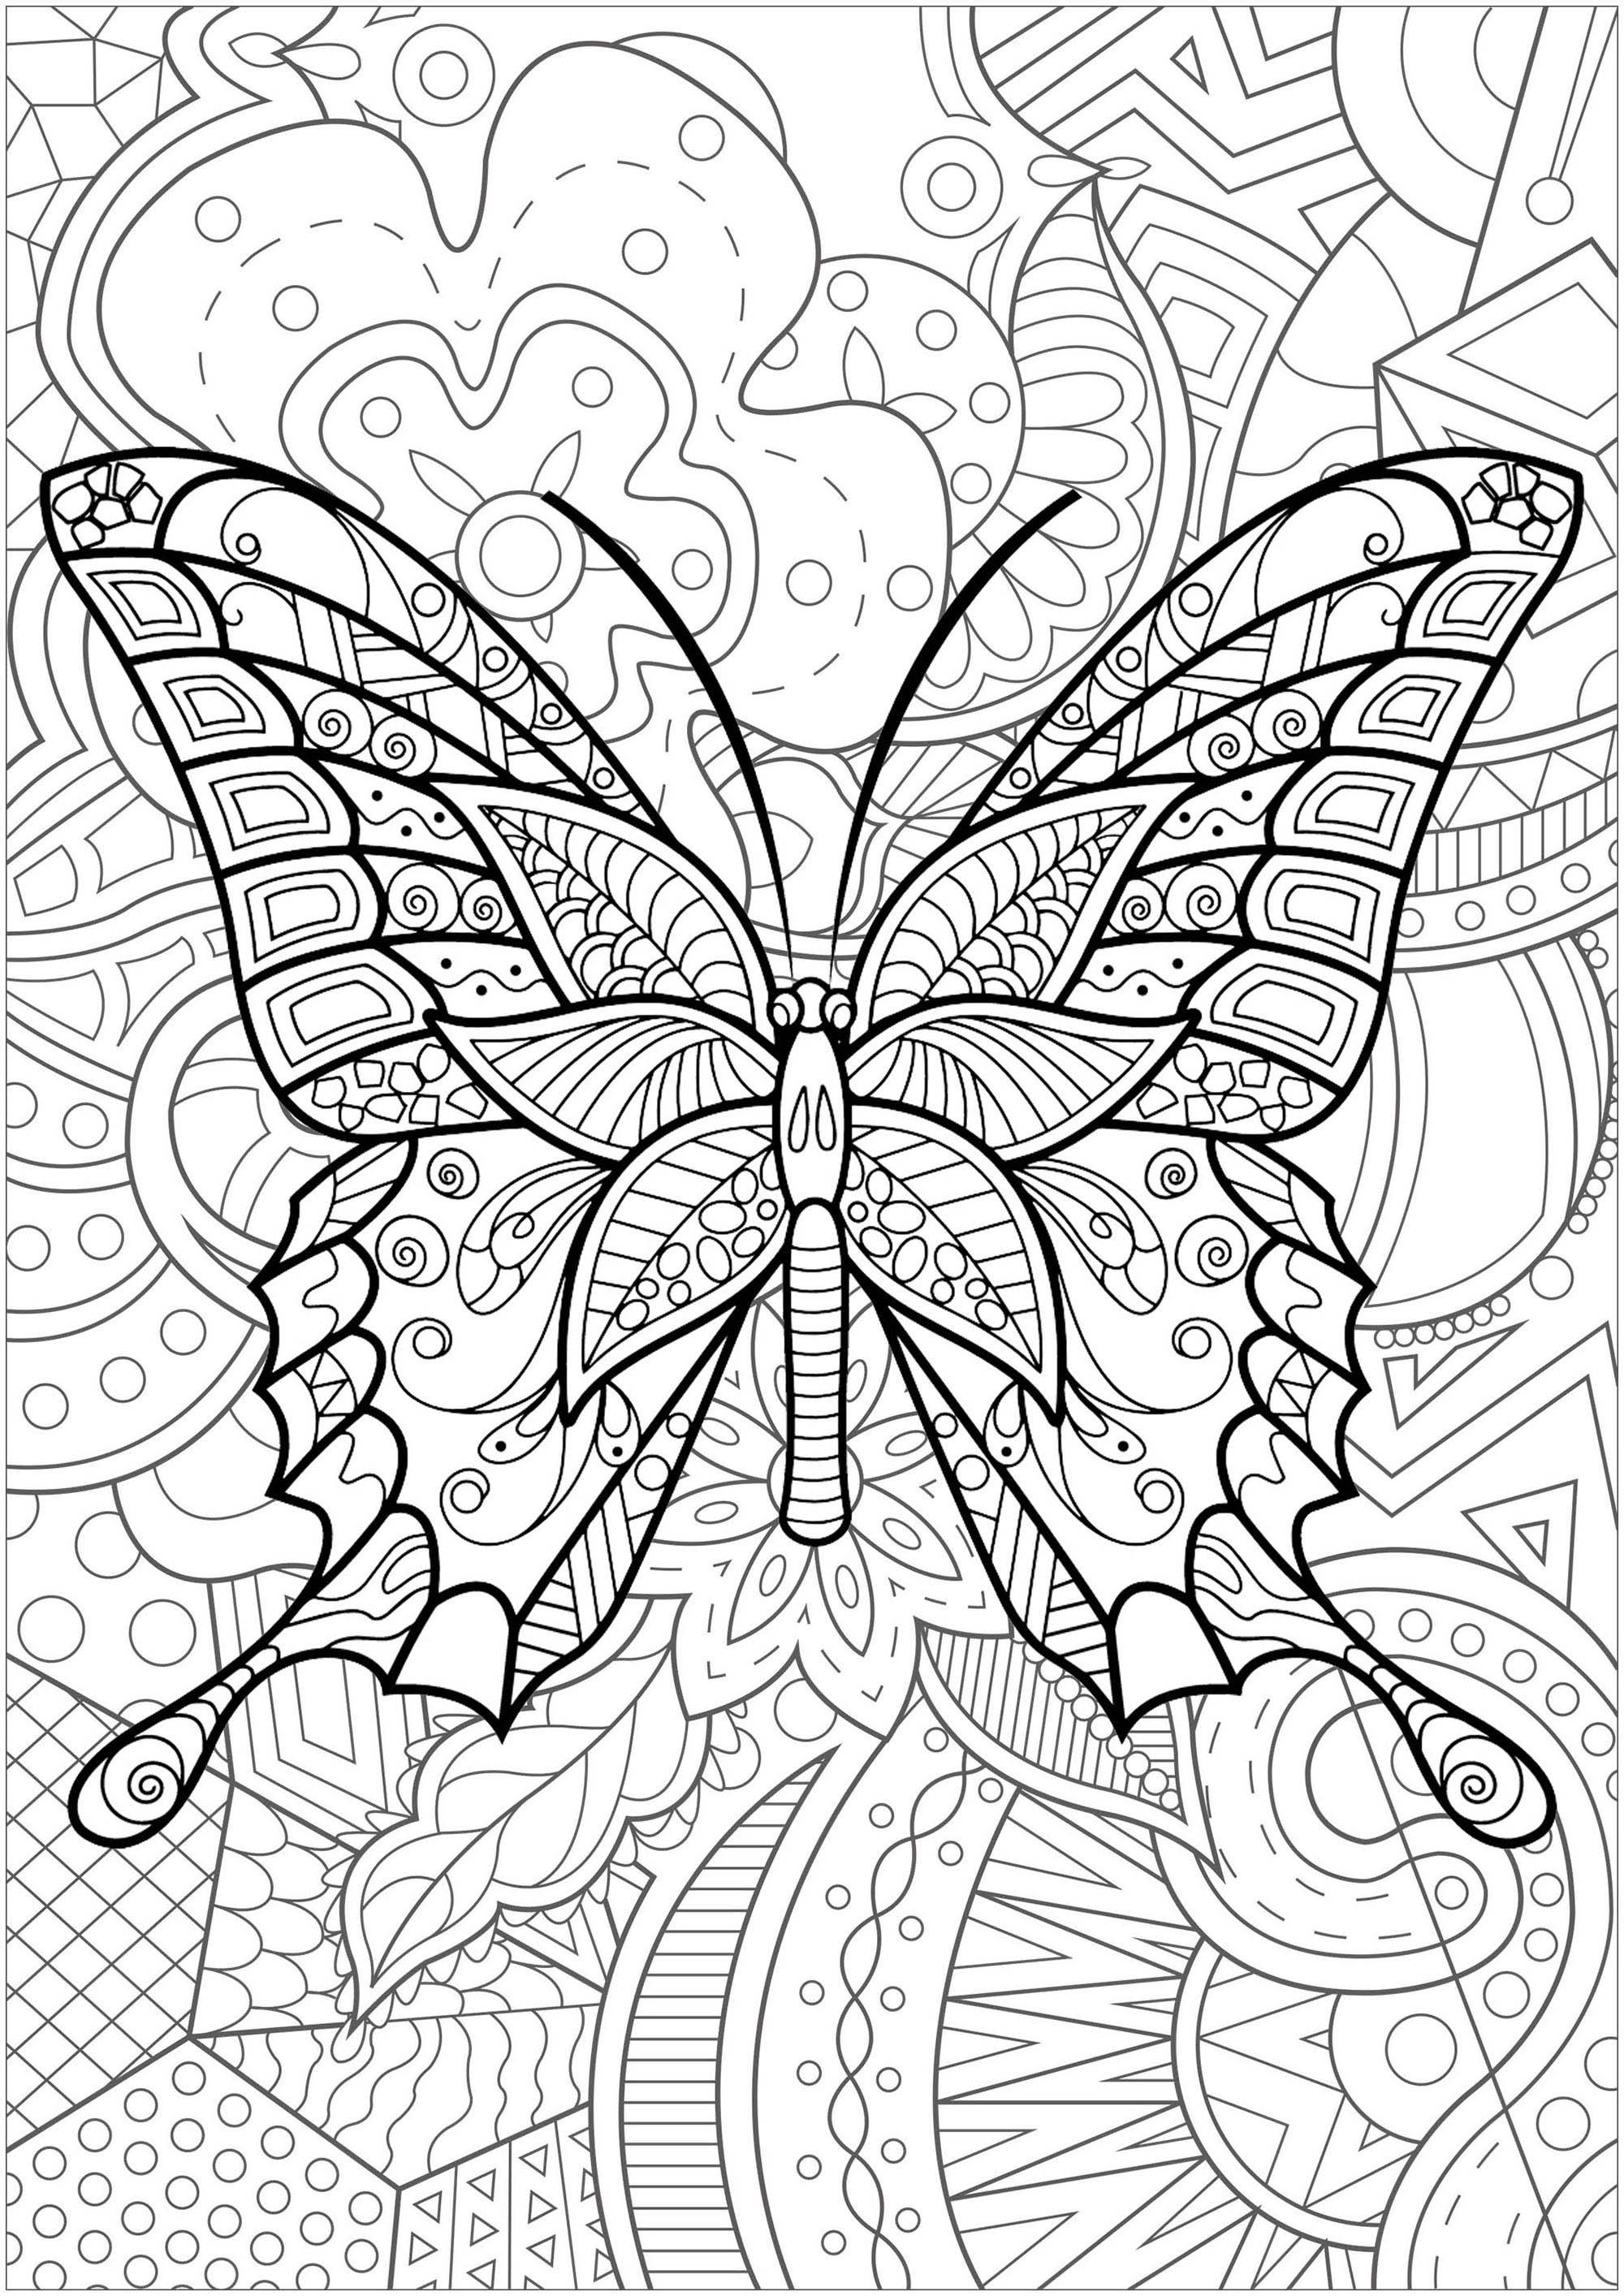 Mariposas E Insectos 51053 Mariposas E Insectos Colorear